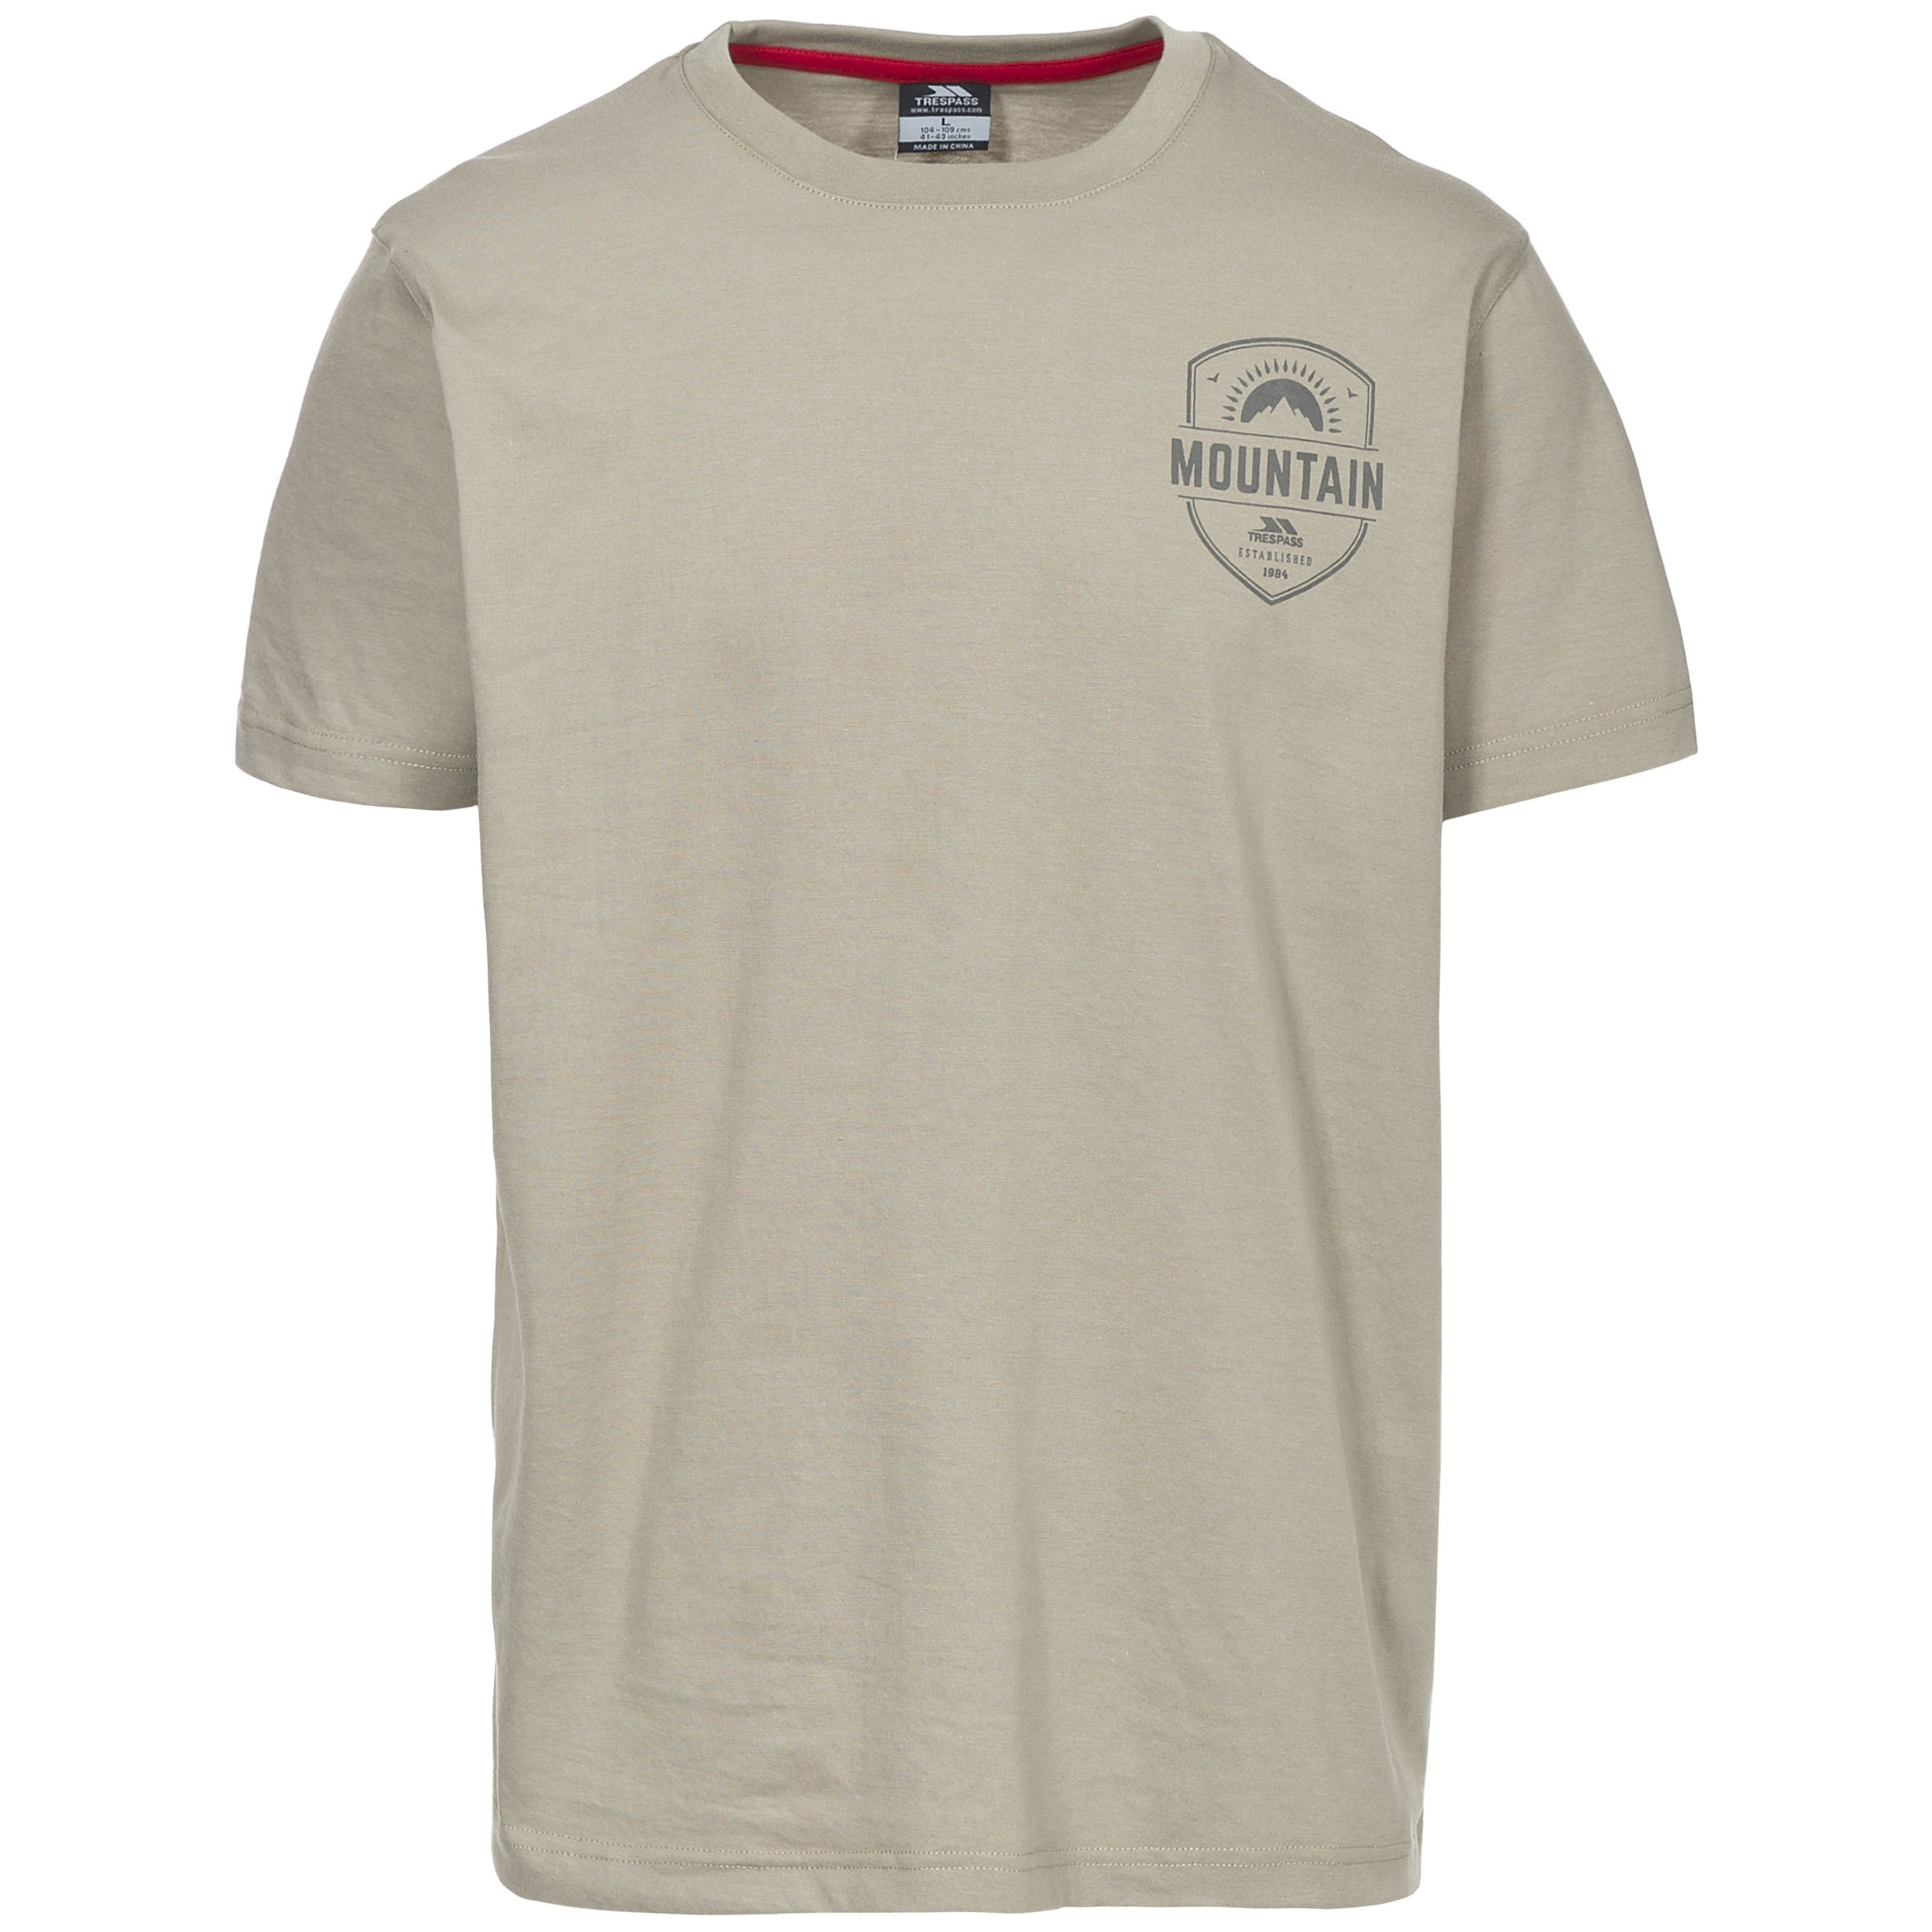 Trespass Mens Rawhider Casual Short Sleeve T-Shirt (XS) (Oatmeal)